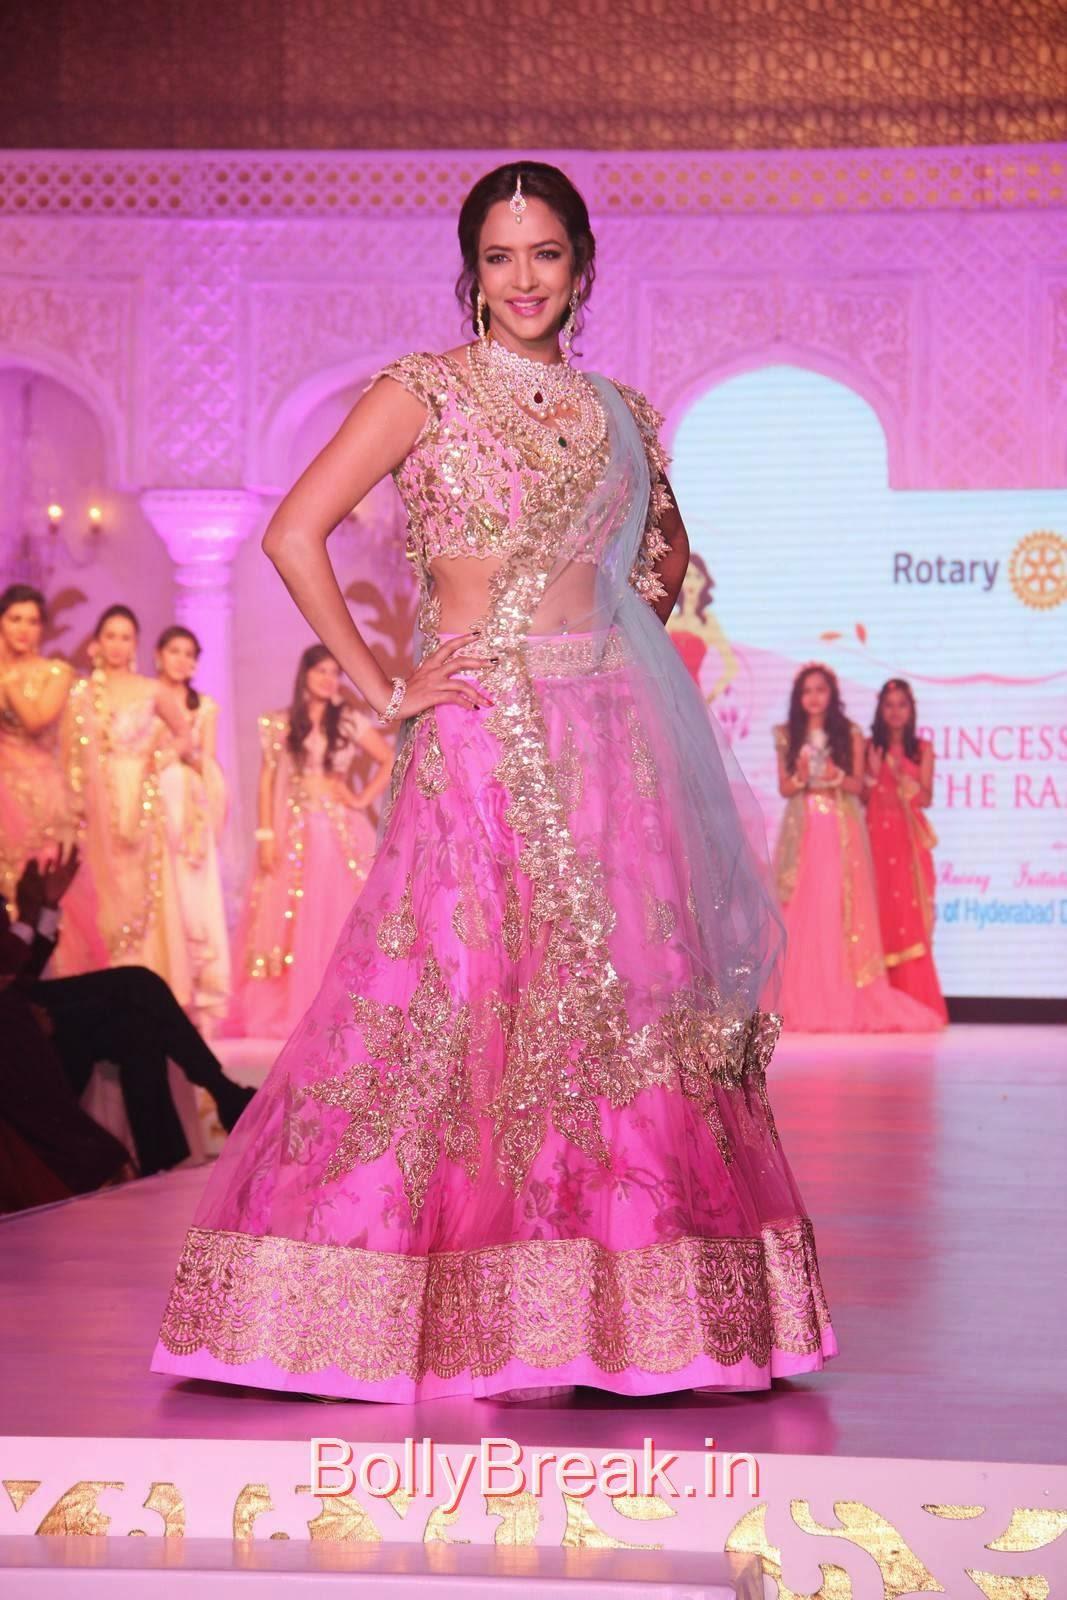 Manchu Lakshmi Stills in pink Lehenga, Manchu Lakshmi Pics in Bridal Lehenga Choli